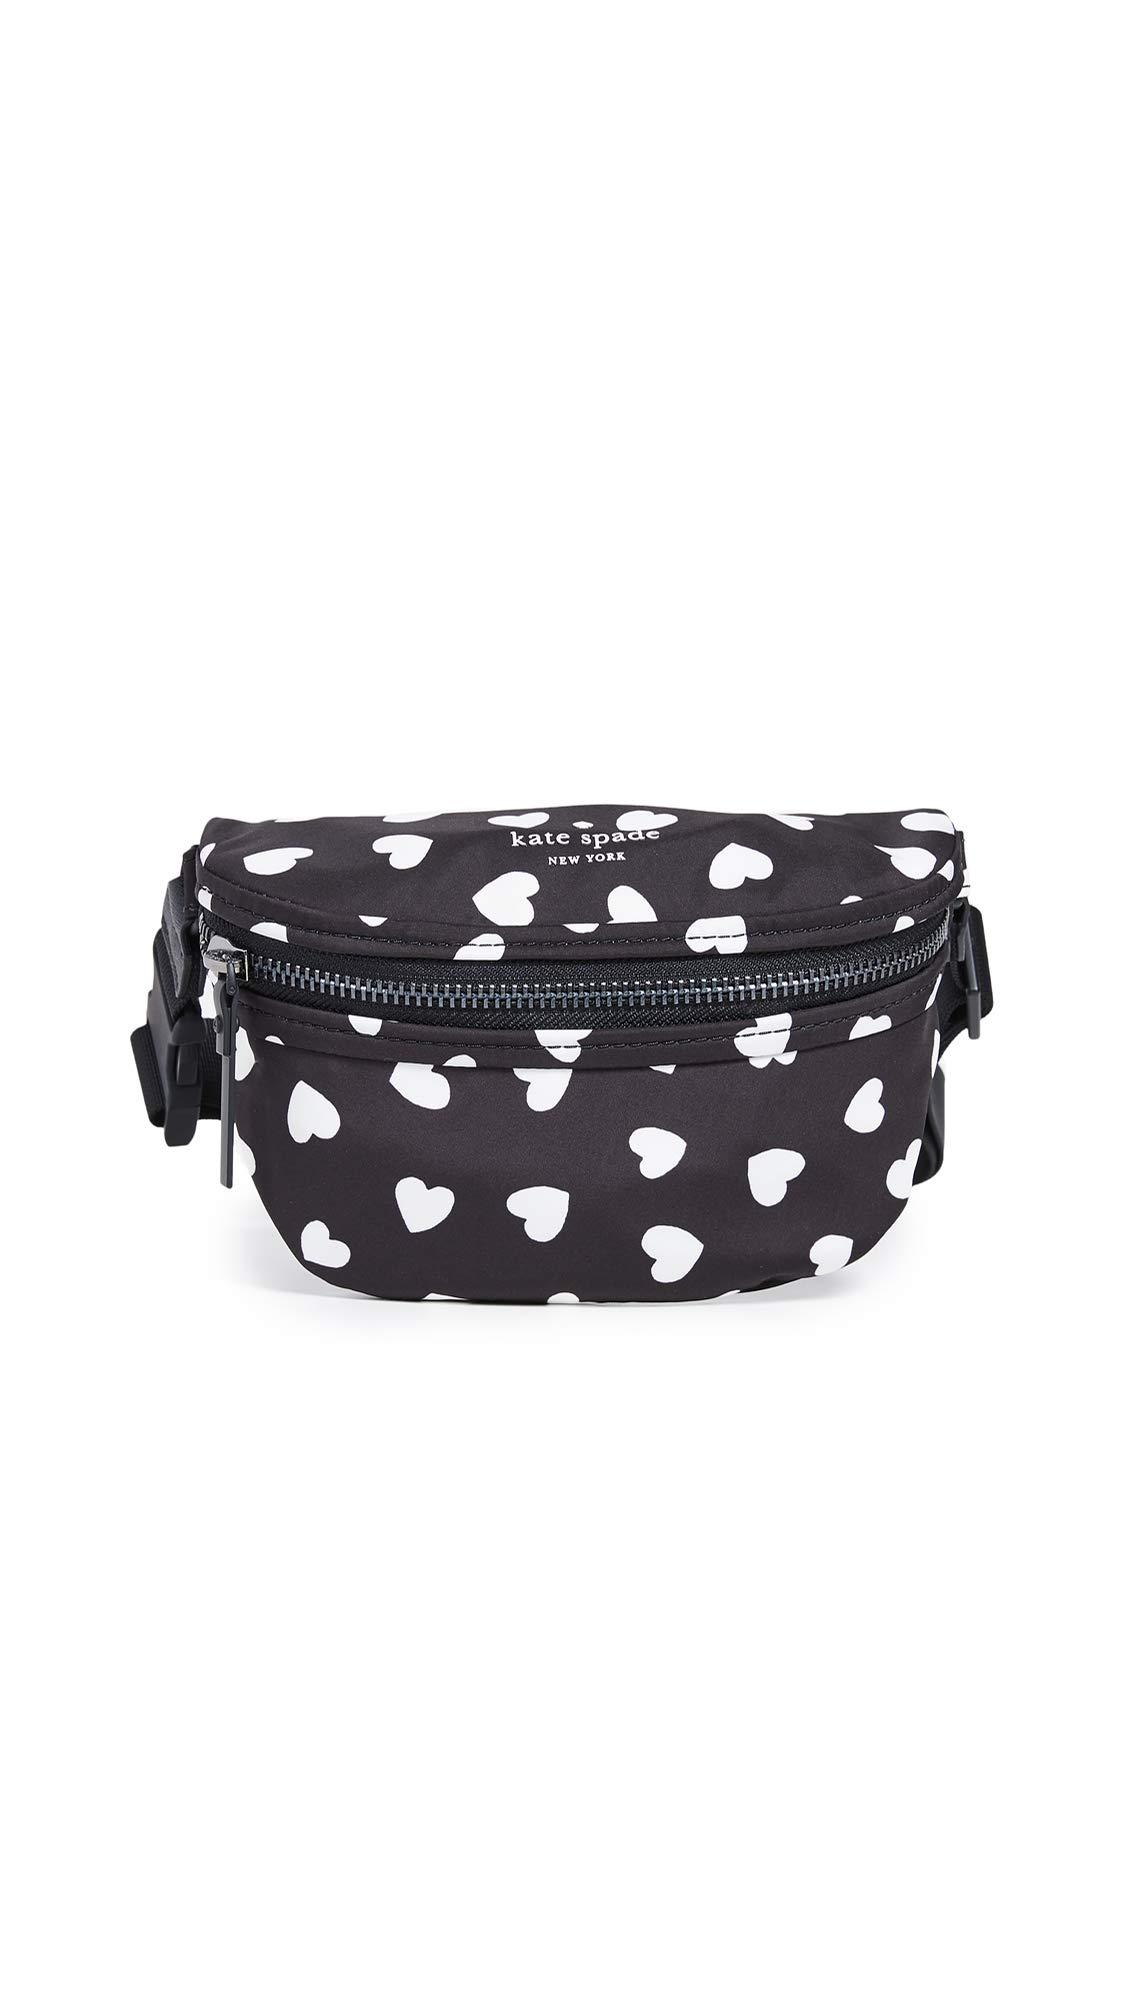 Kate Spade New York Women's That's The Spirit Belt Bag, Black/Cream, One Size